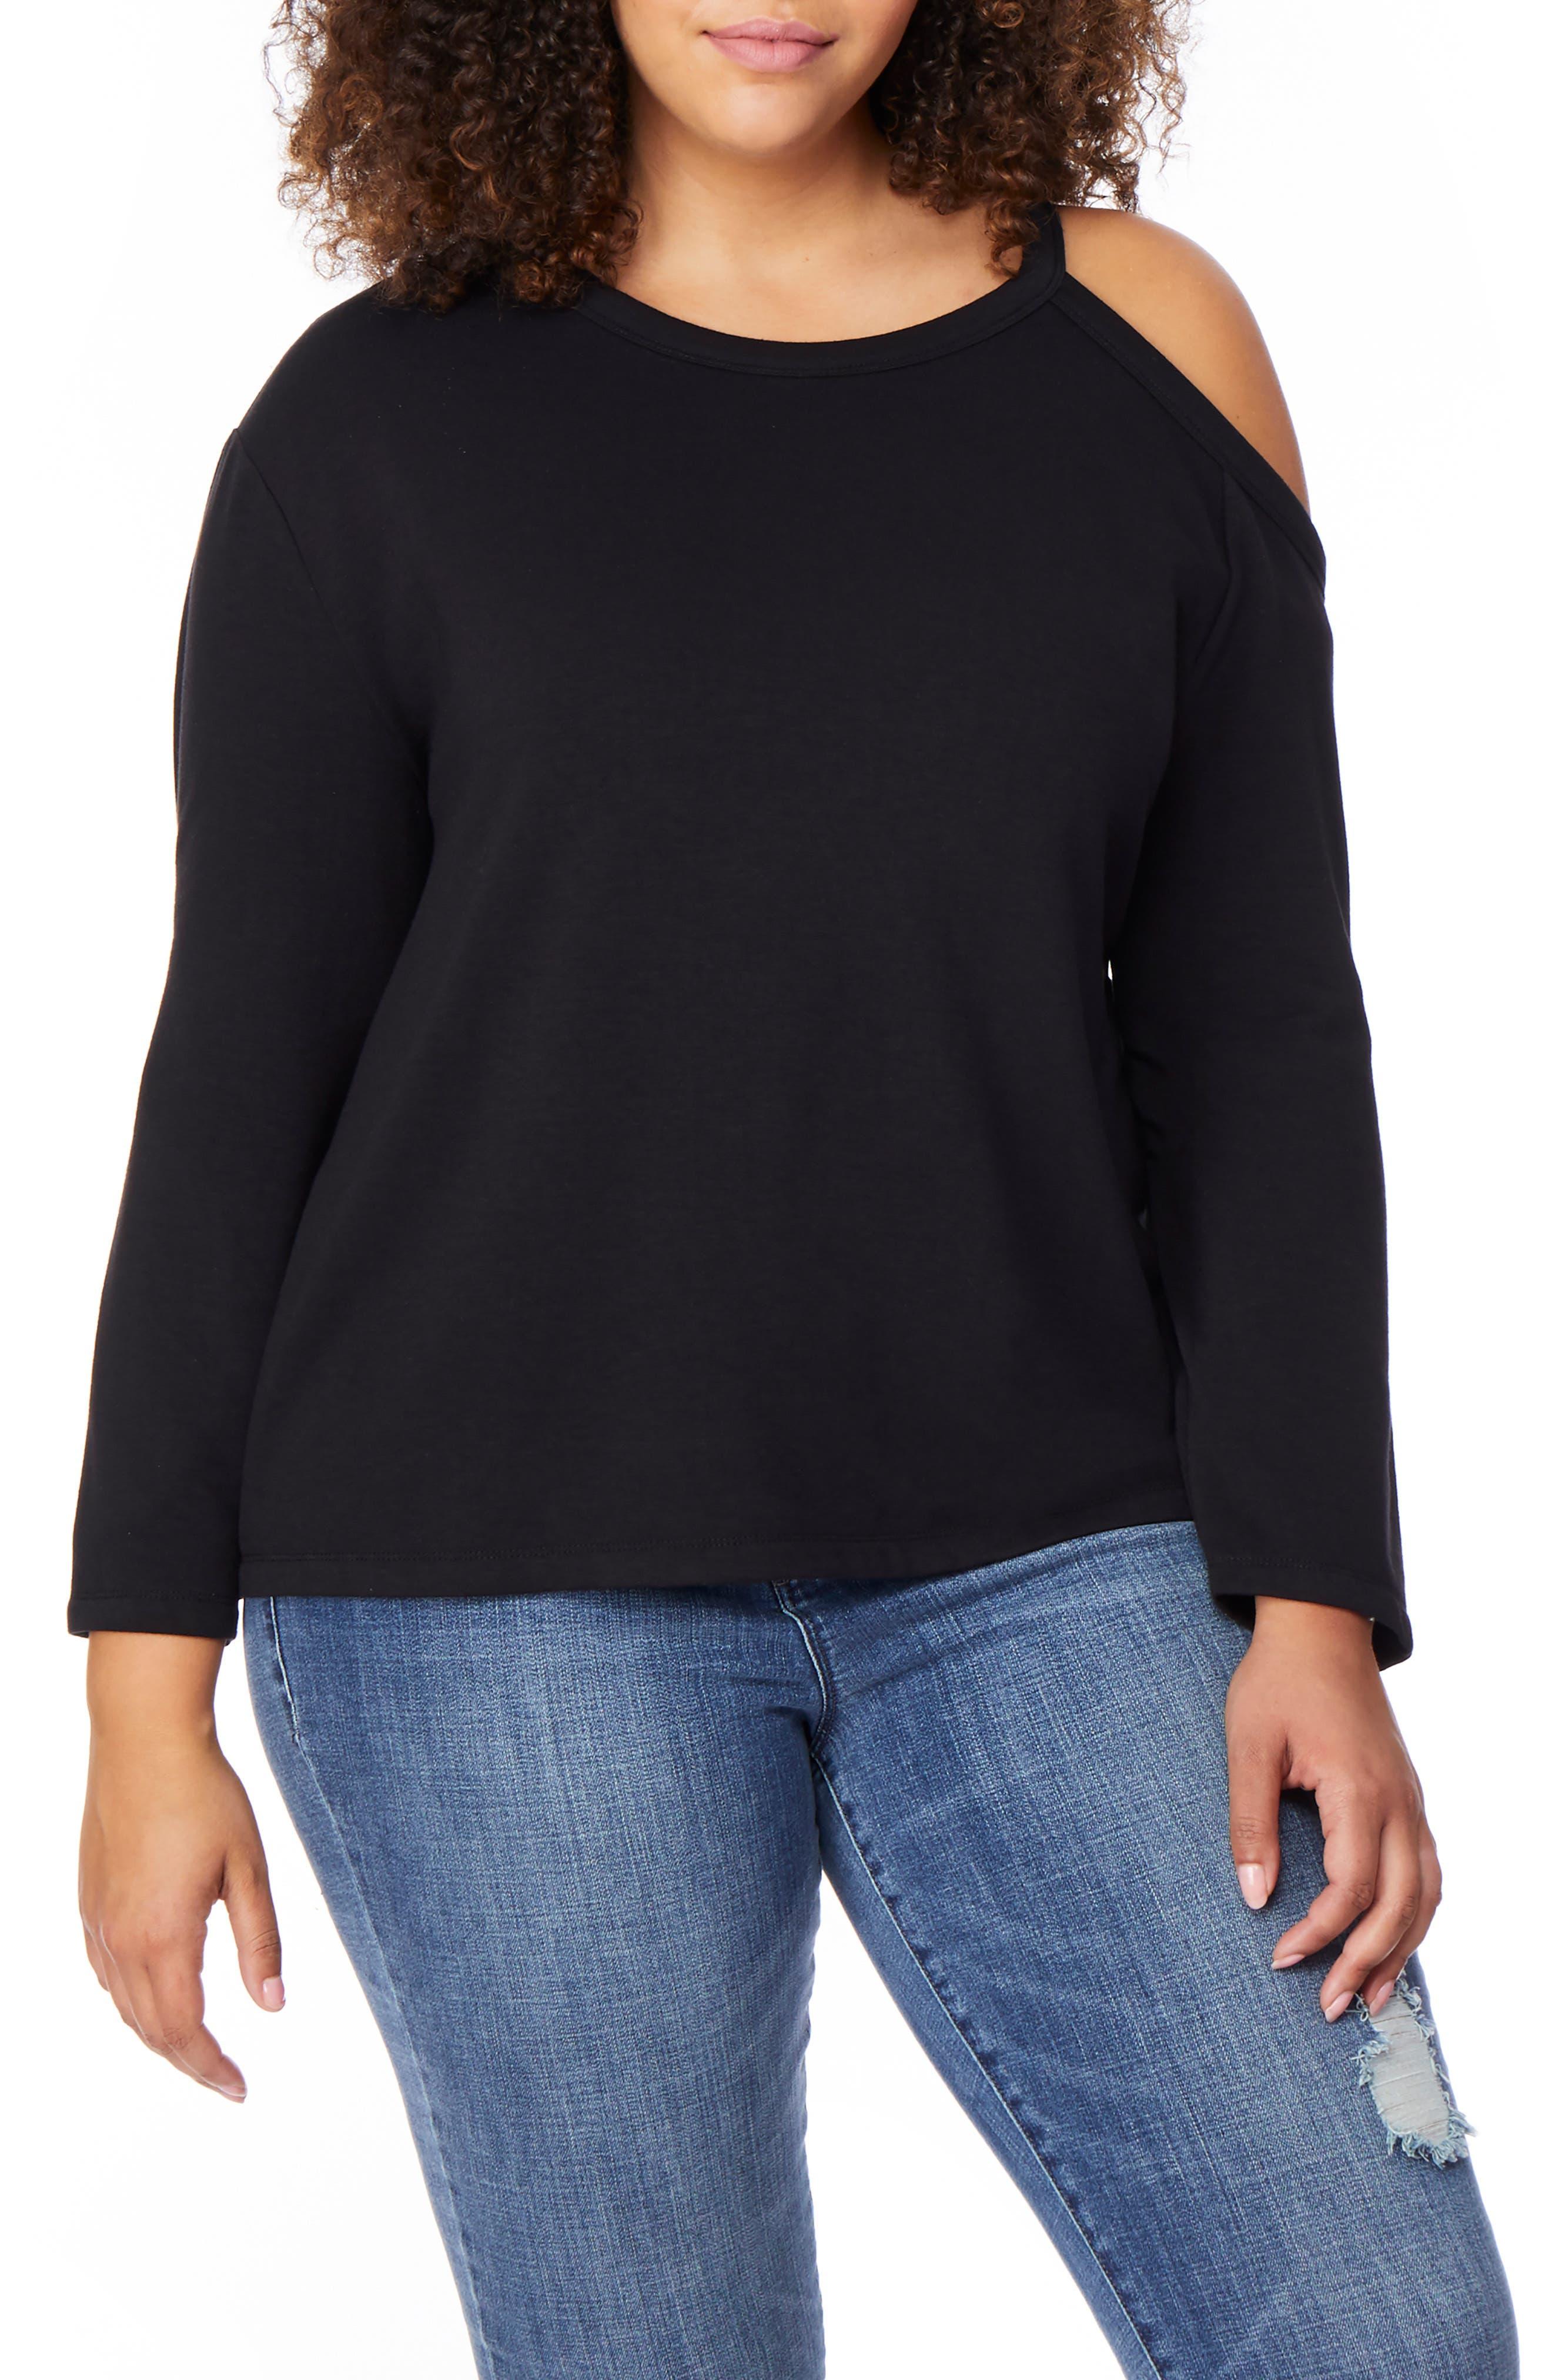 Plus Size Rebel Wilson X Angels Cold Shoulder Sweatshirt, Black